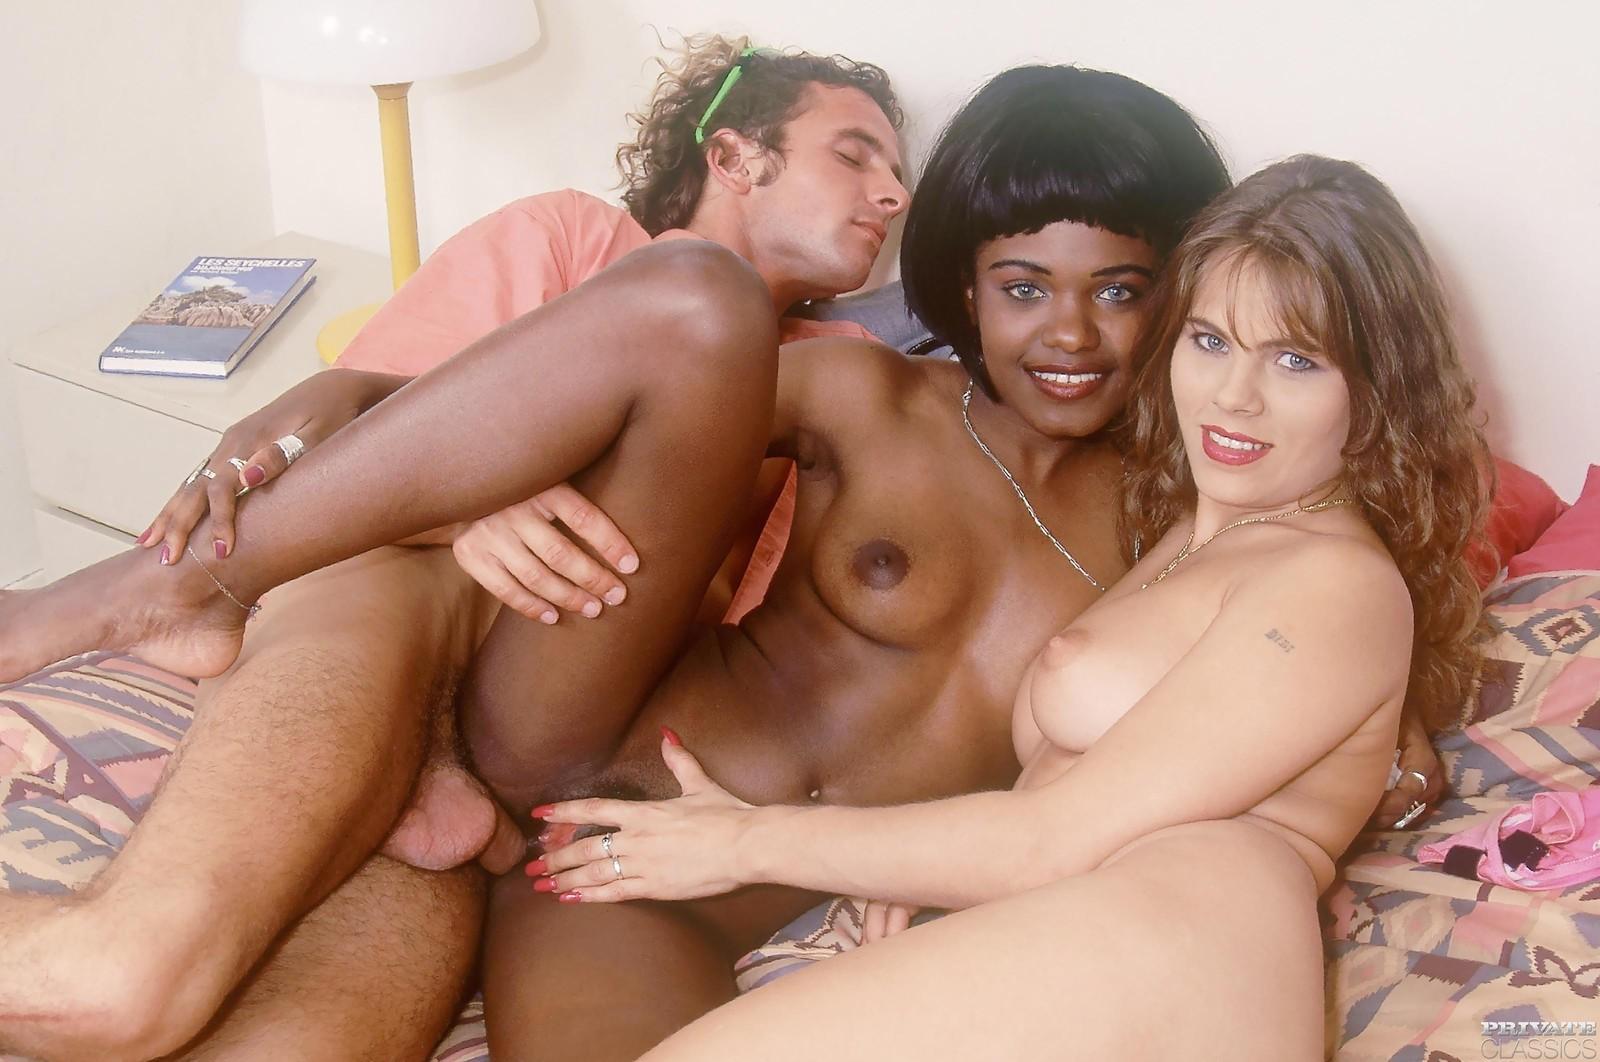 A Love Story Porn micaela & valy verdi, a love story - private classics 80803